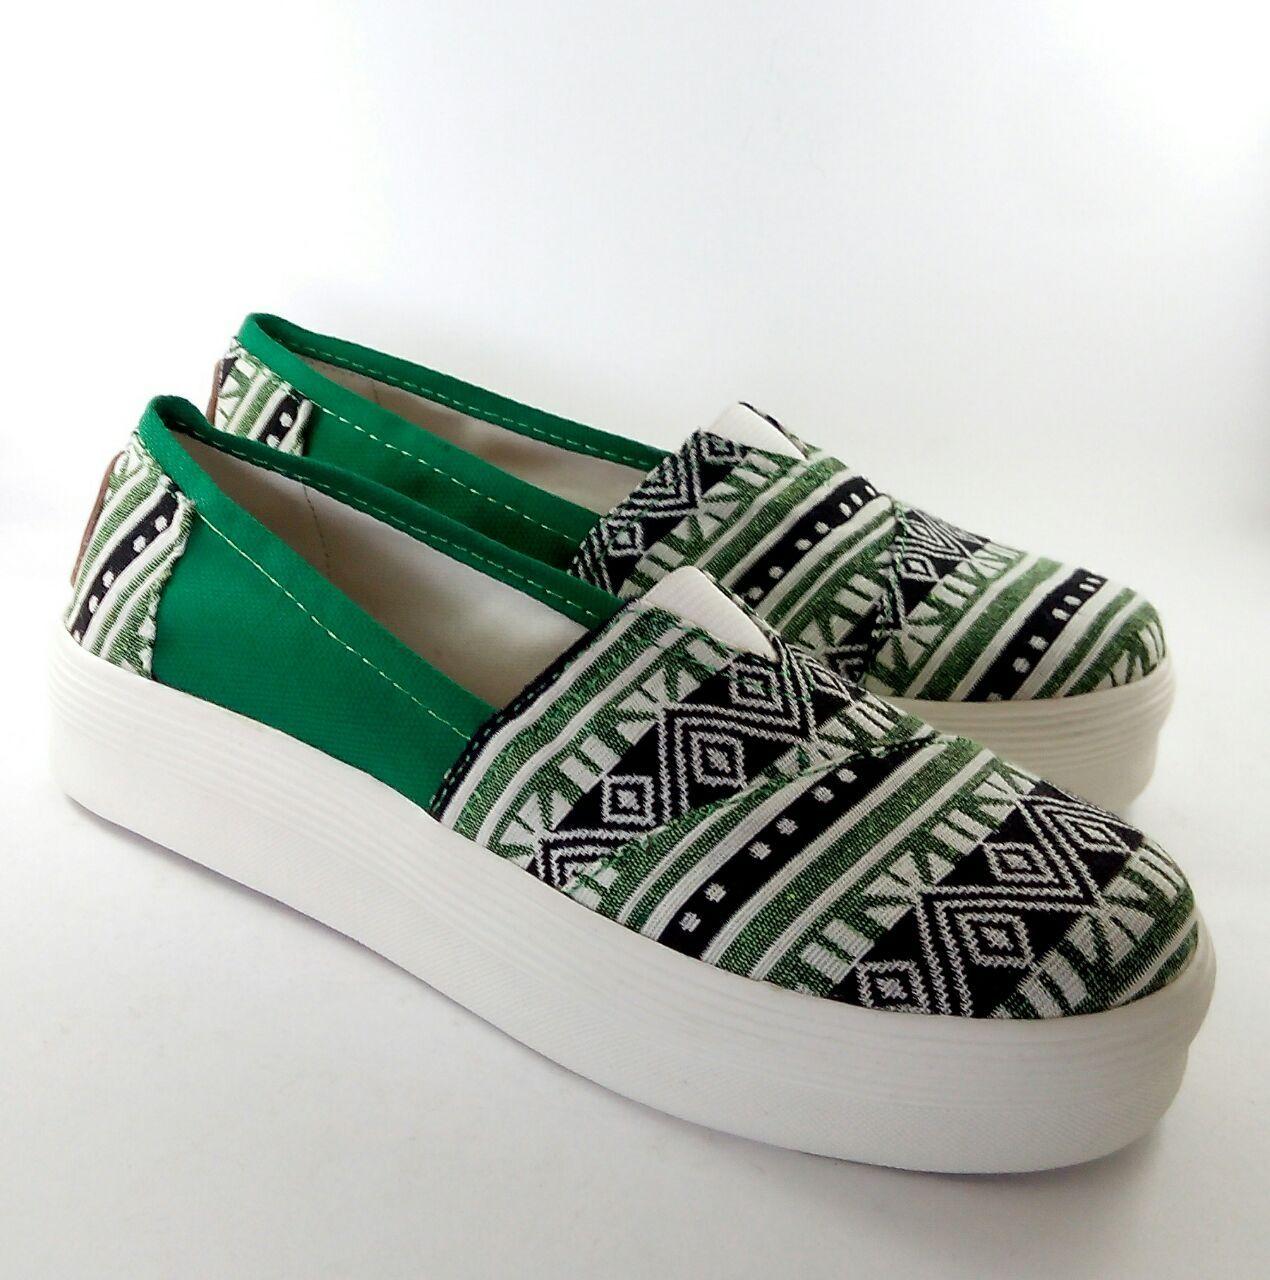 Sepatu kanvas (Flat shoes) handmade asli buatan Indonesia Hi! U Foxing  Kelly |